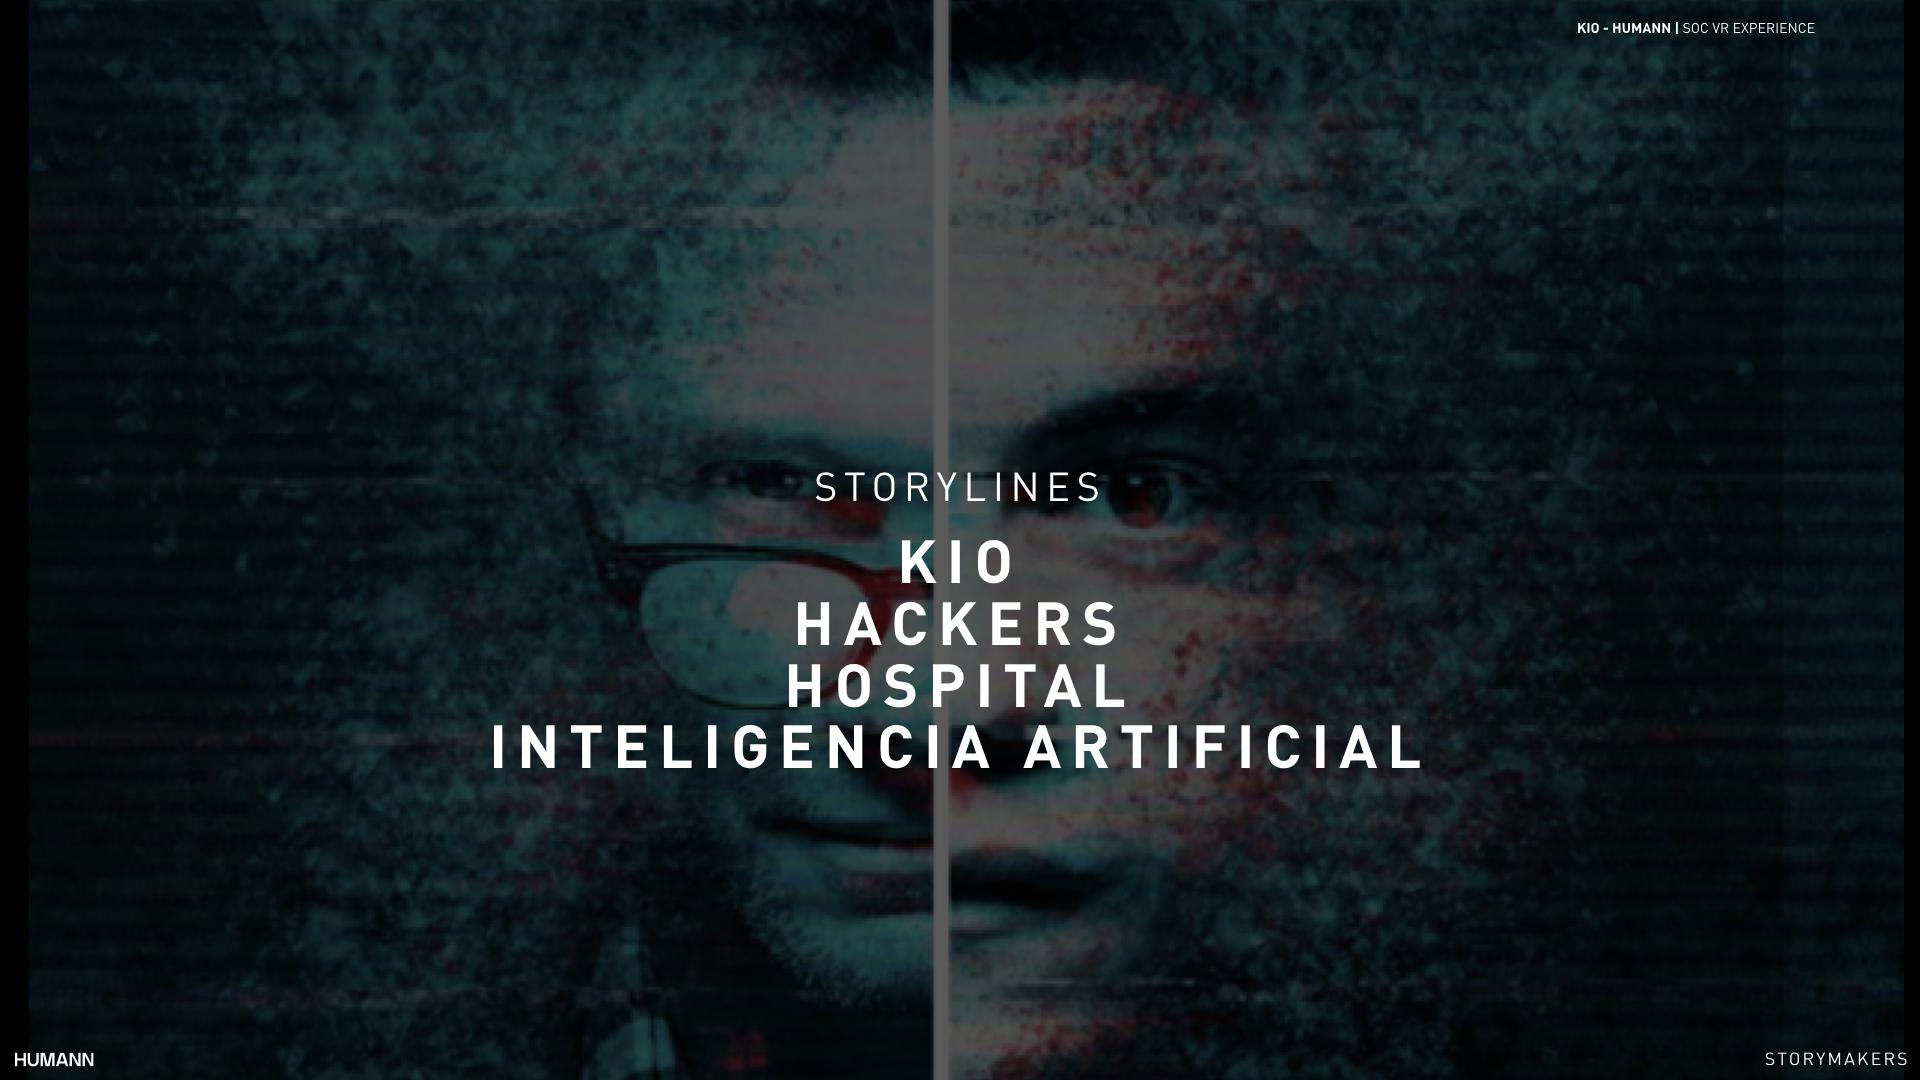 KIO SOC VR HUMANN.016.png